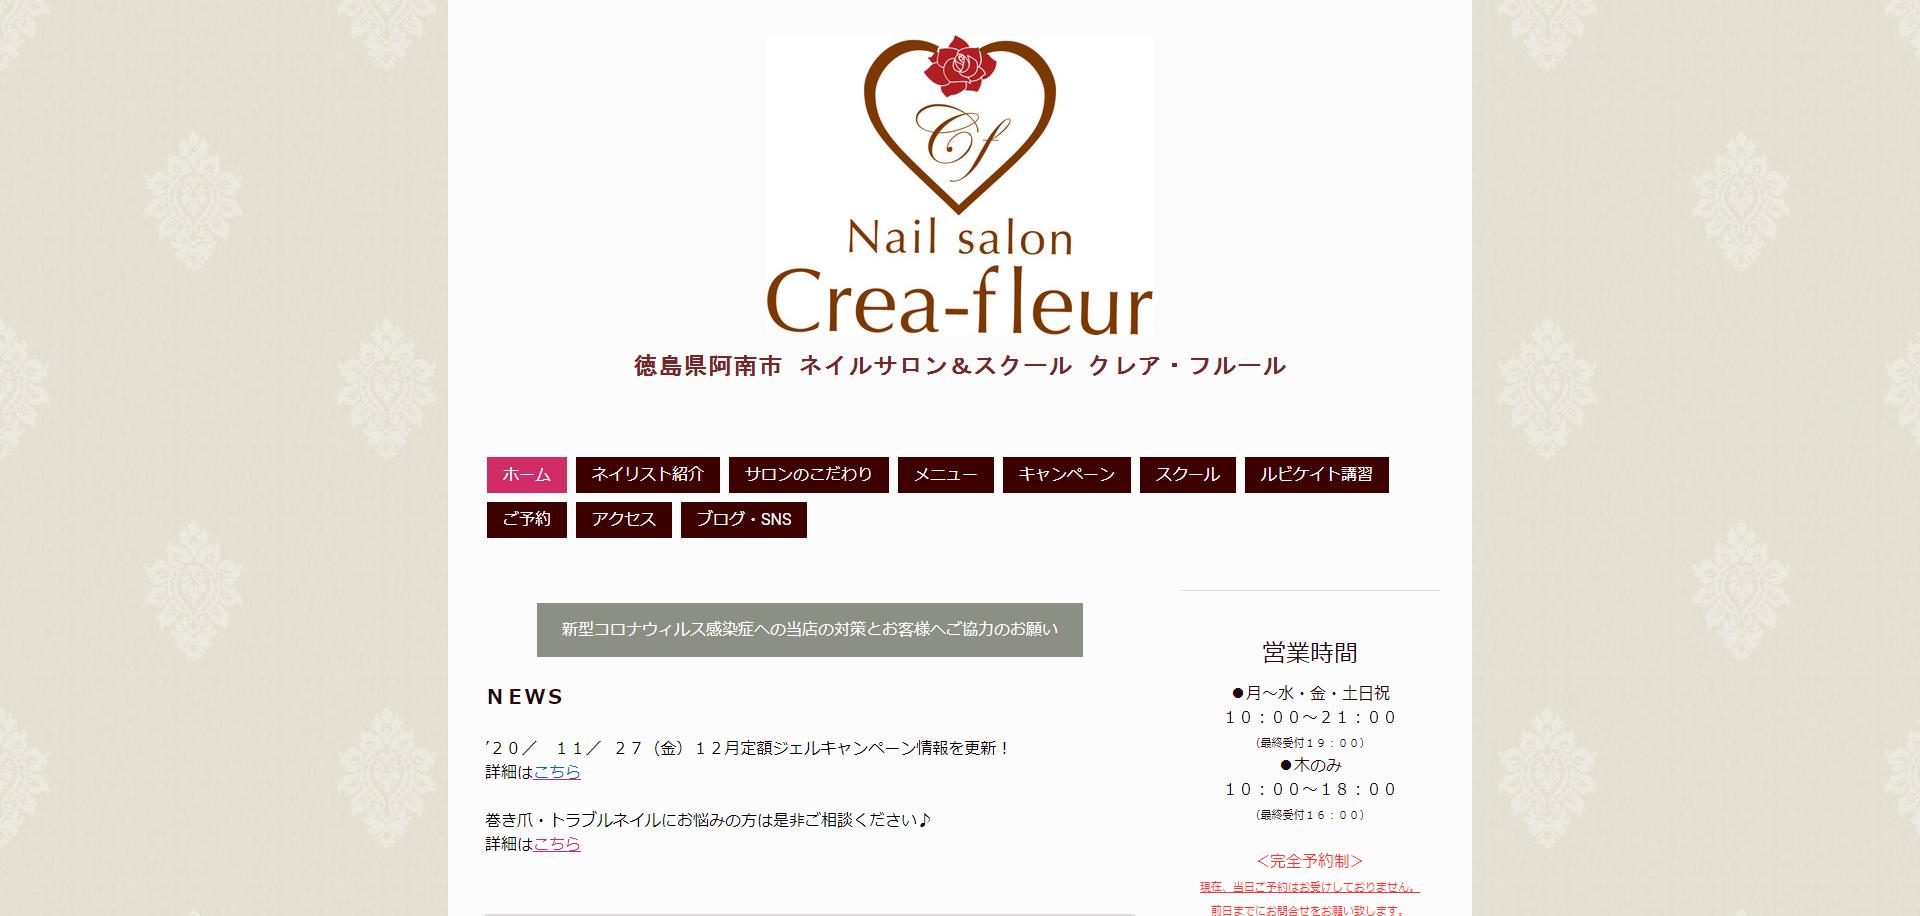 Crea-fleur(クレア・フルール)